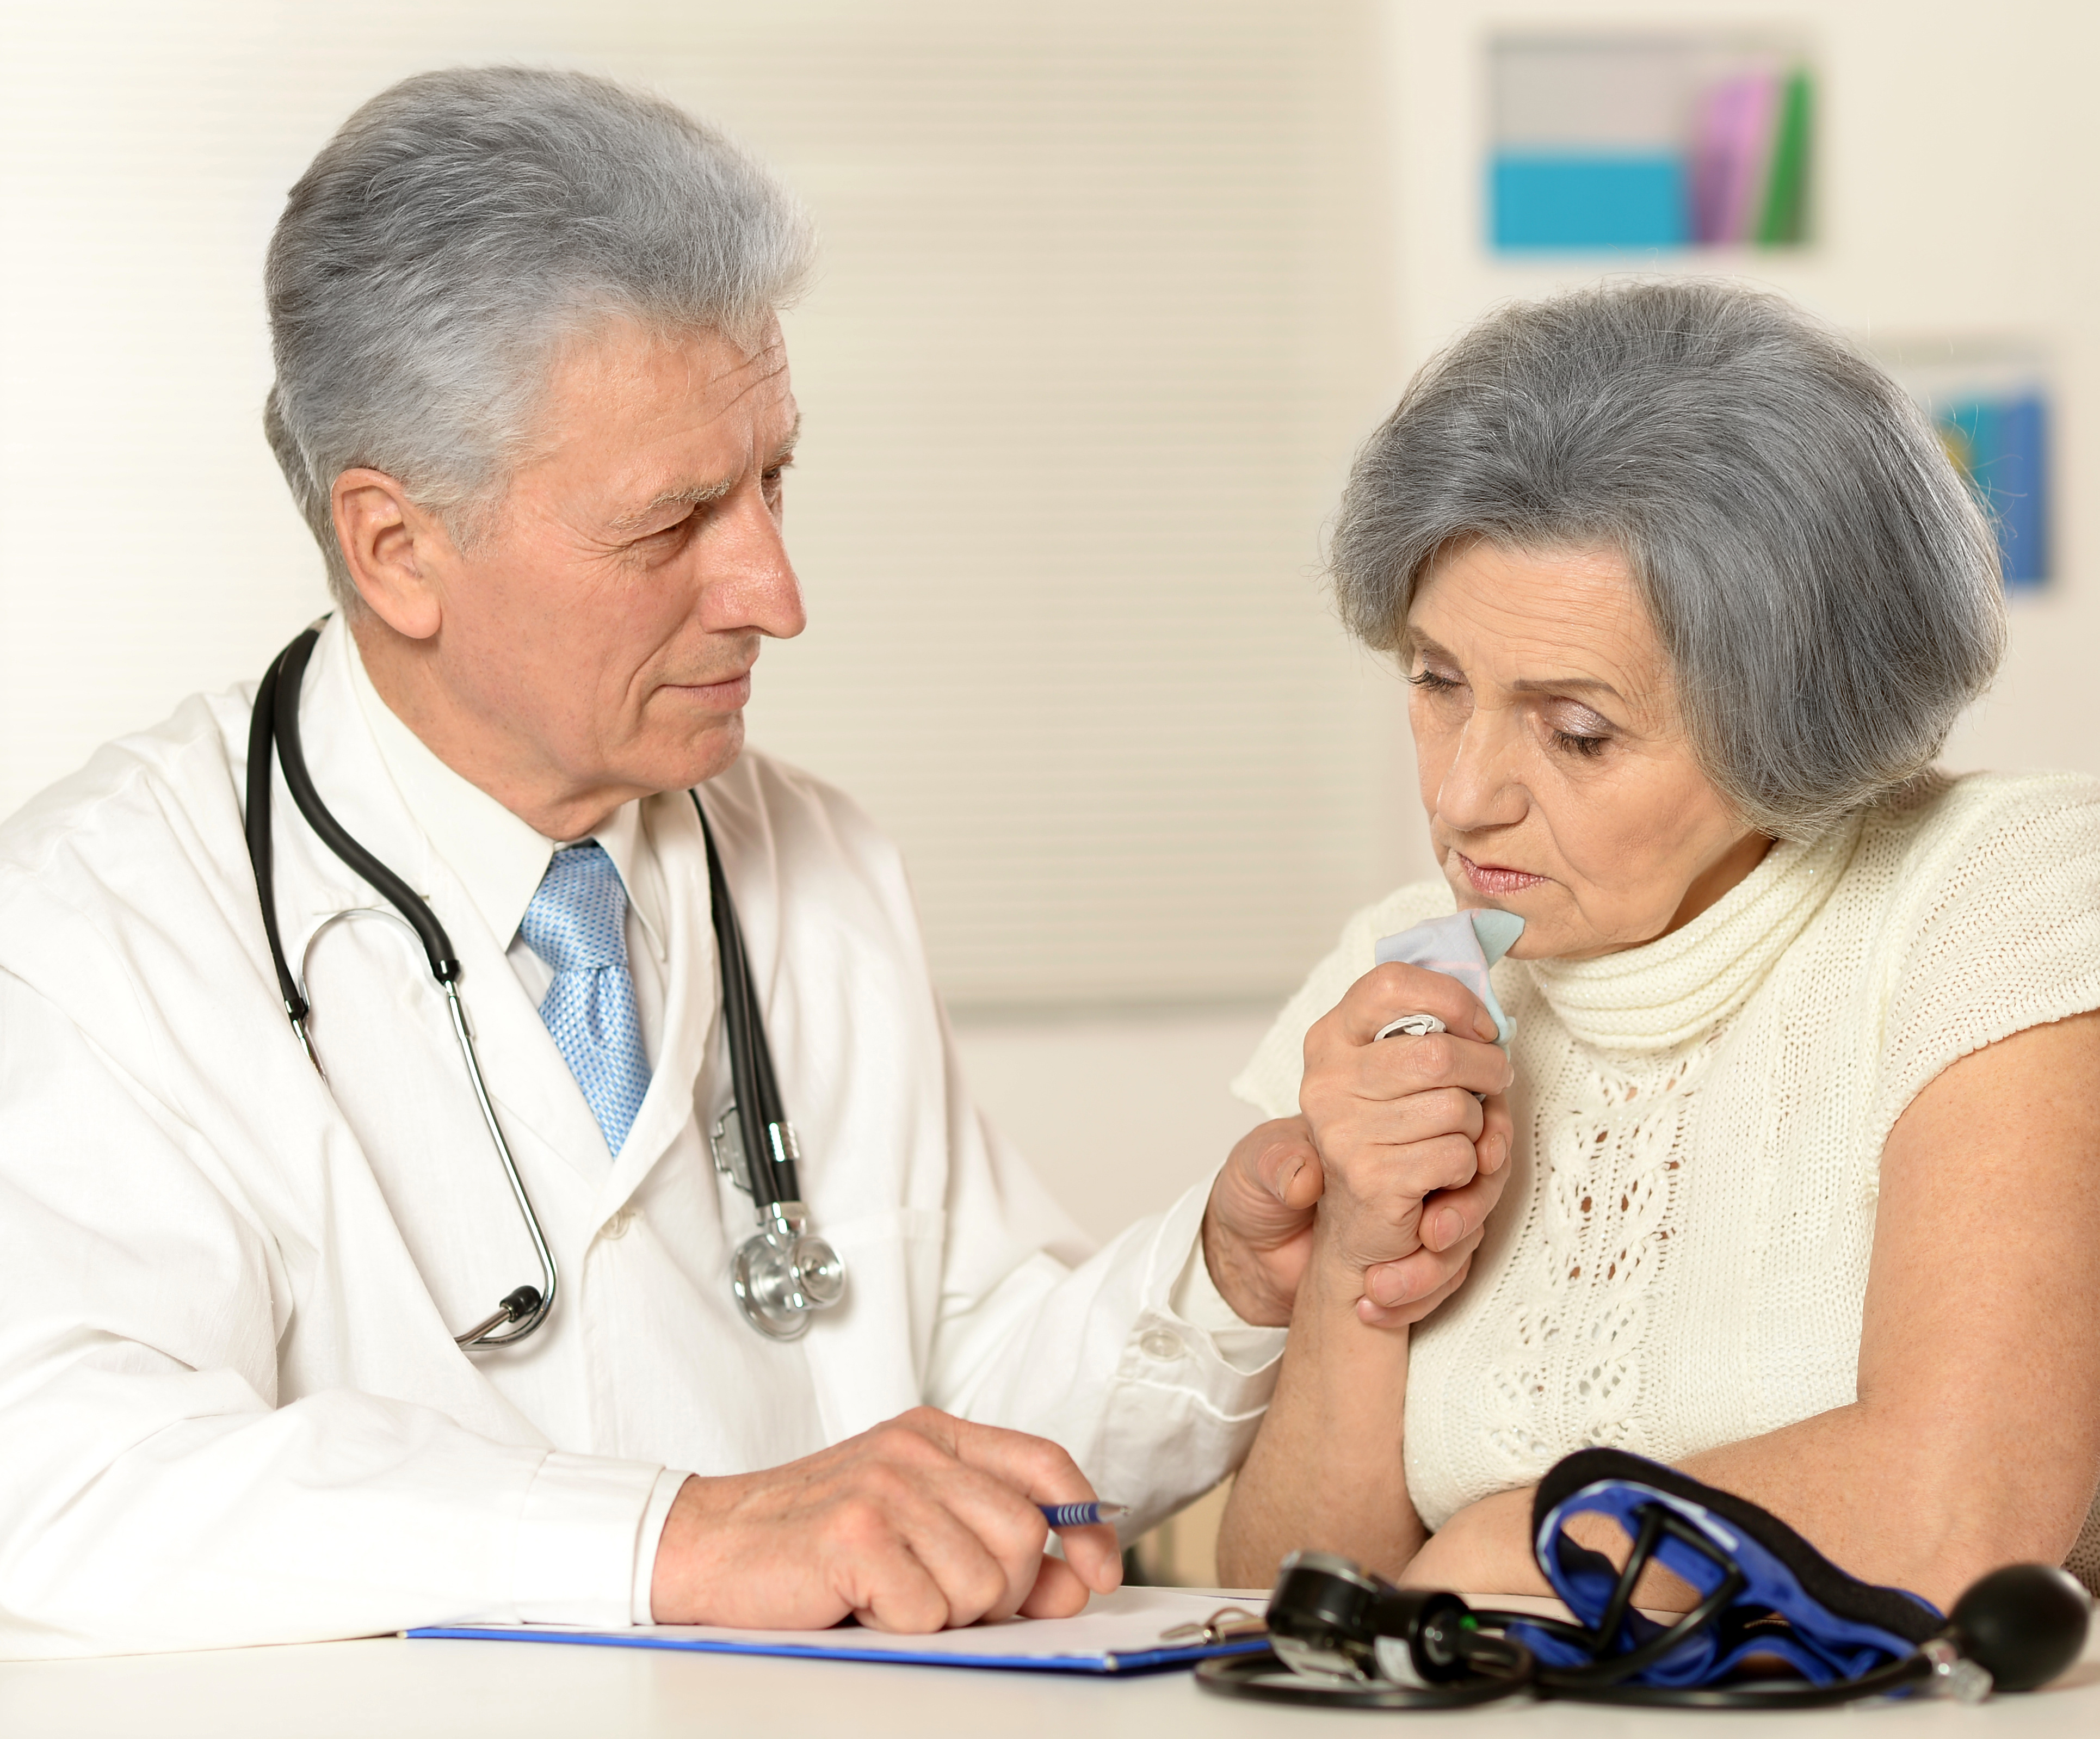 Portrait of a doctor examine patient, senior woman